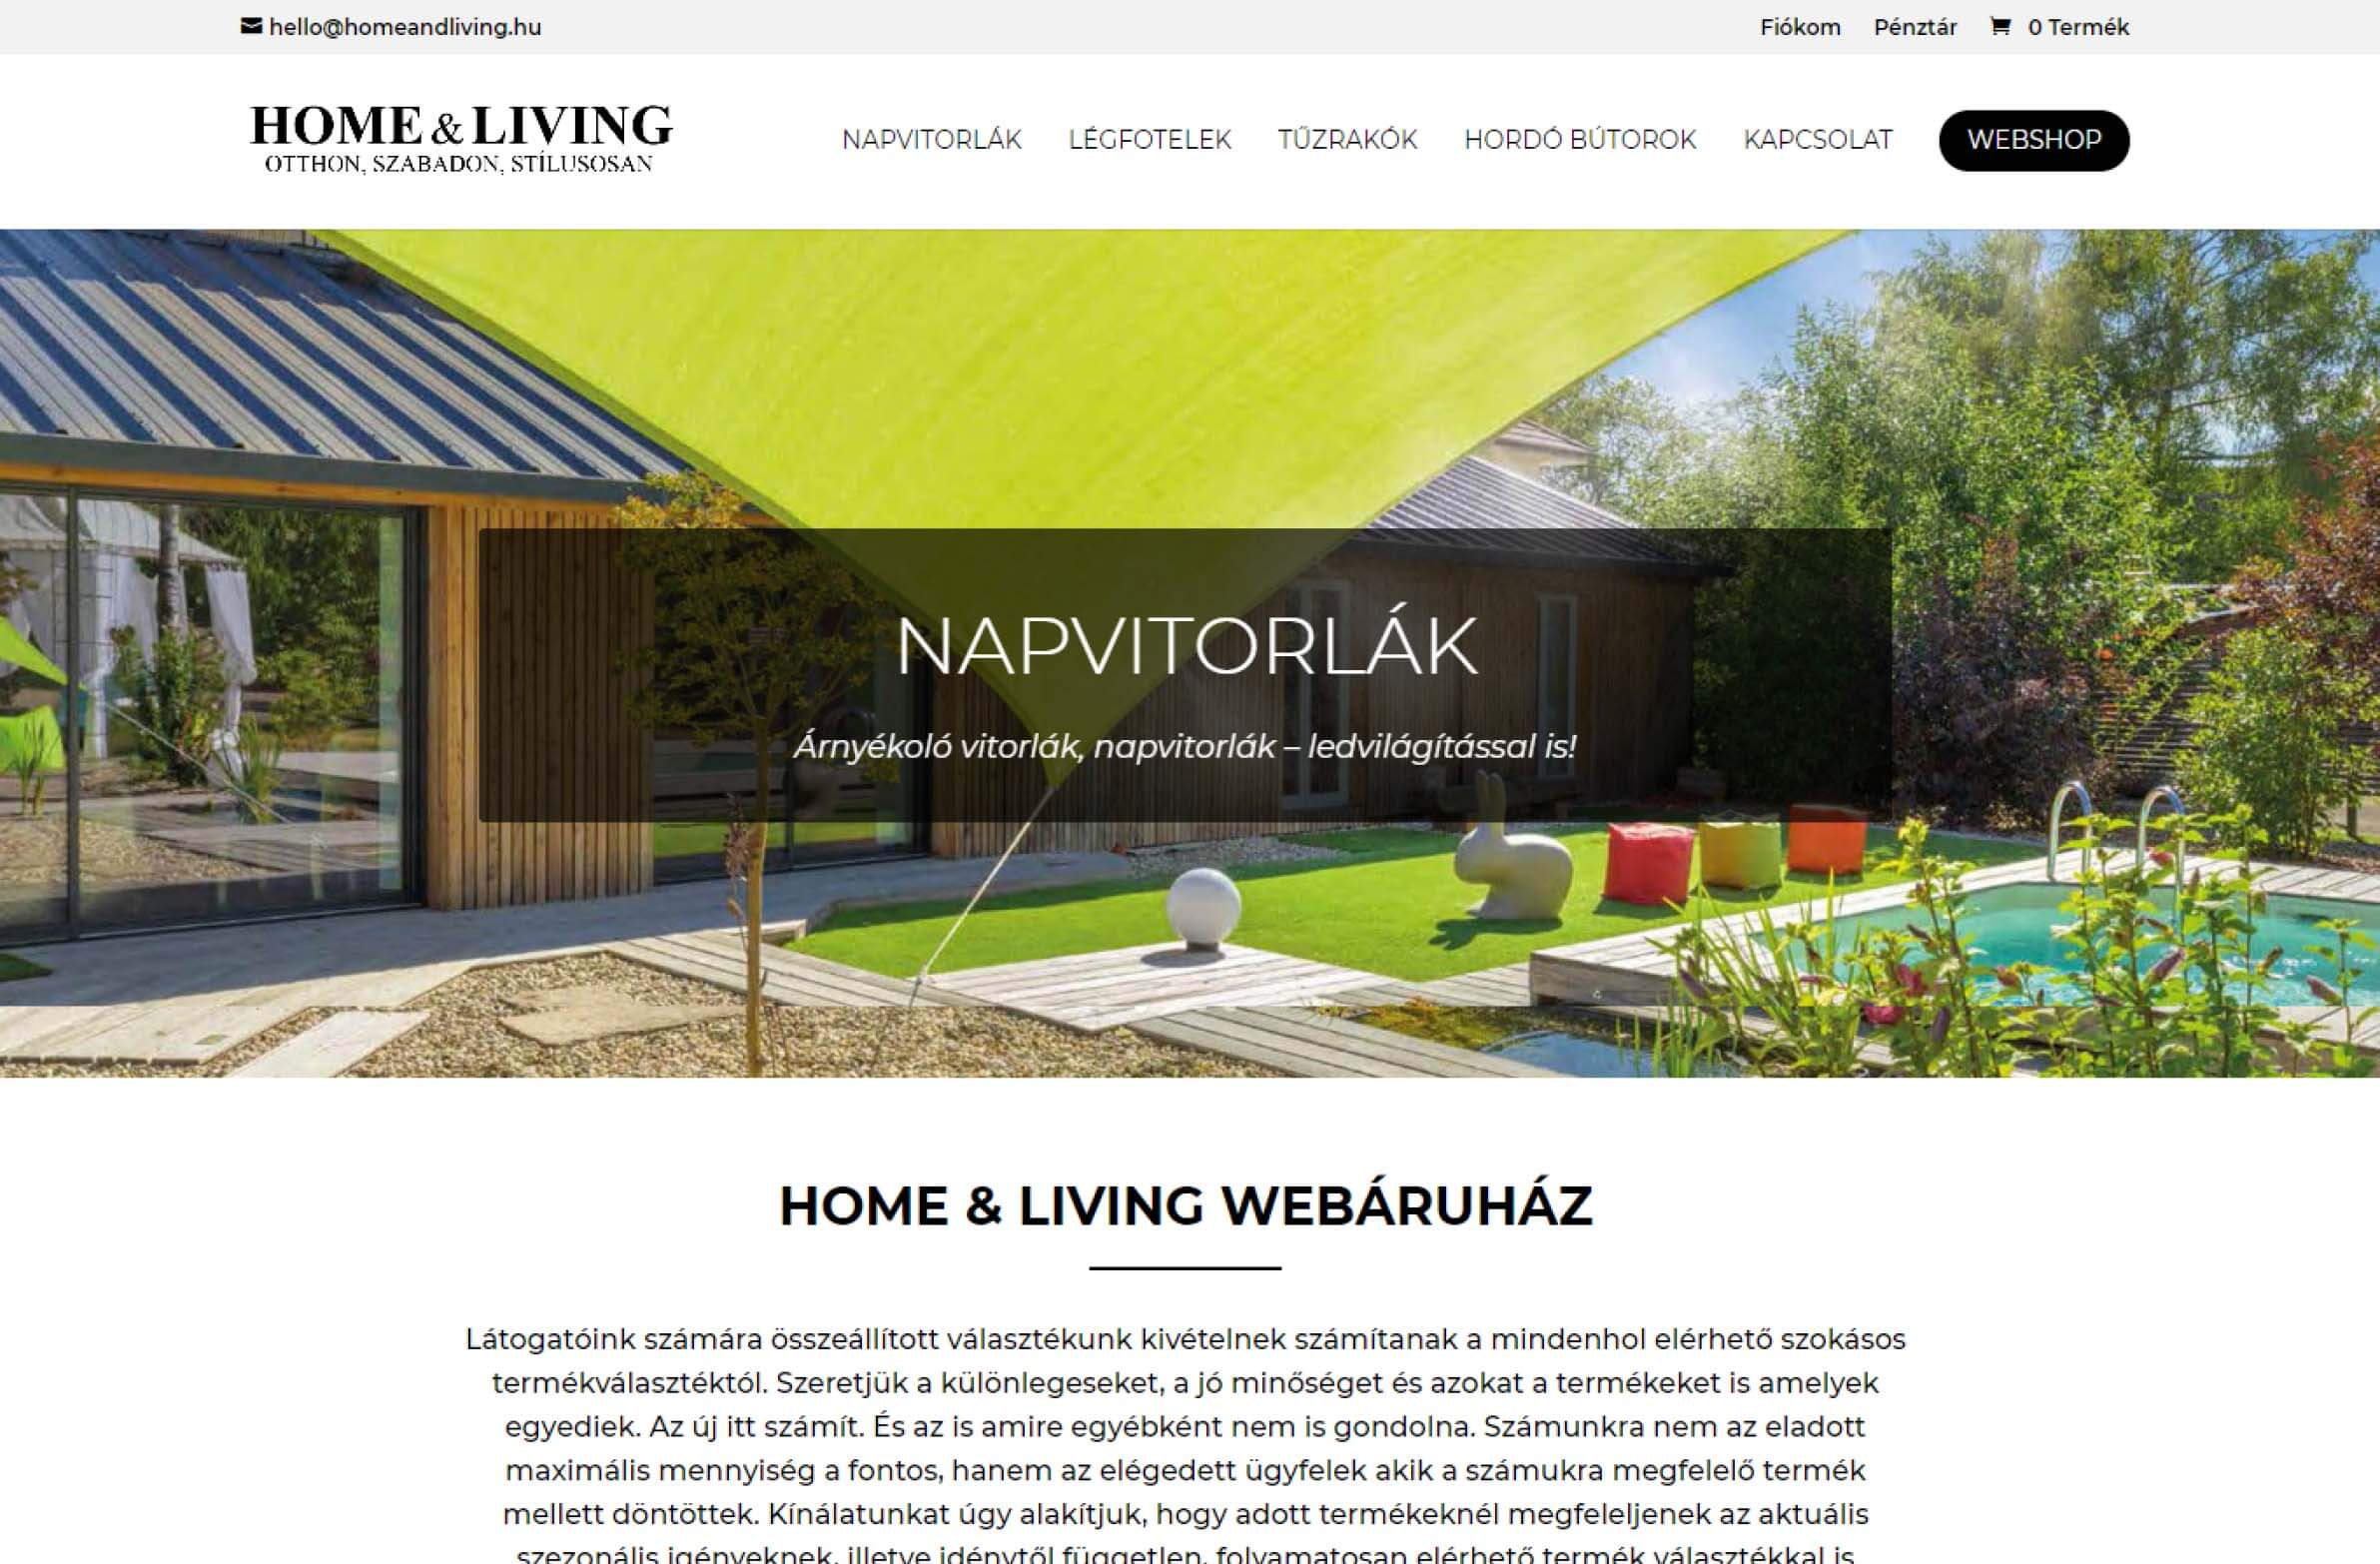 homeandliving.hu honlapkép